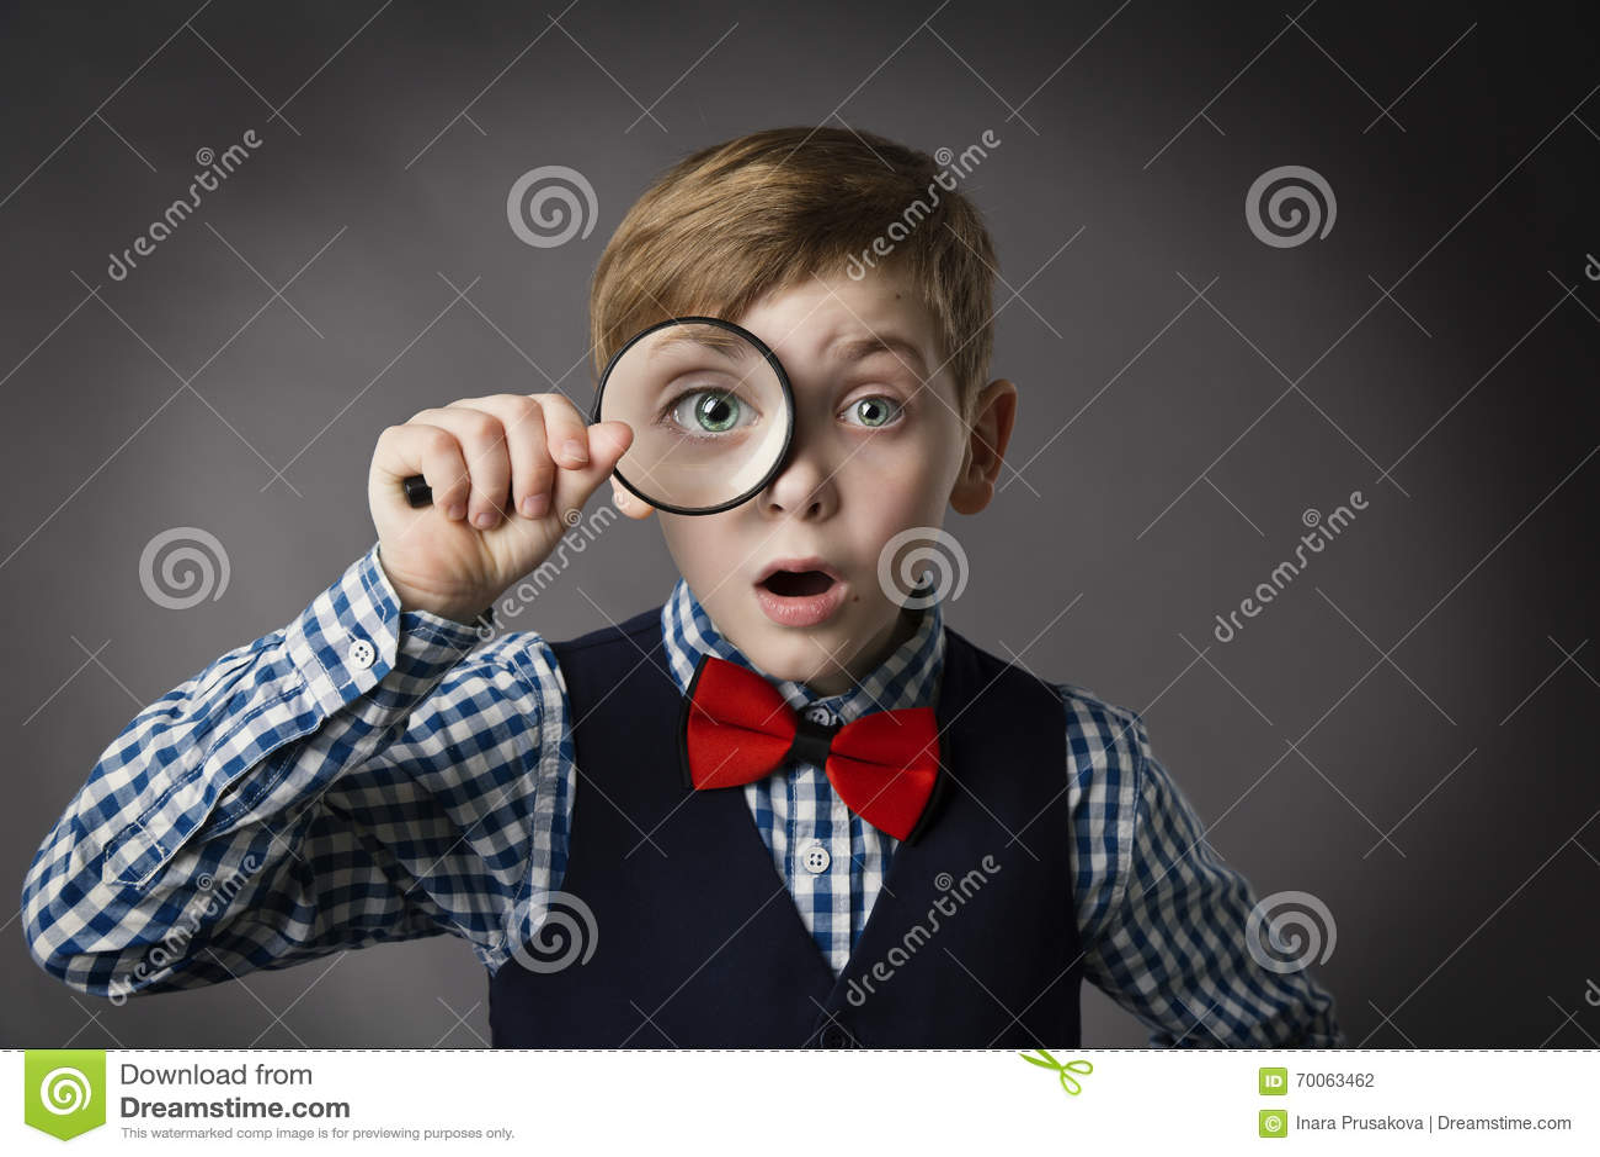 Ребенок видит до конца лупу, объектив увеличителя глаза ребенк